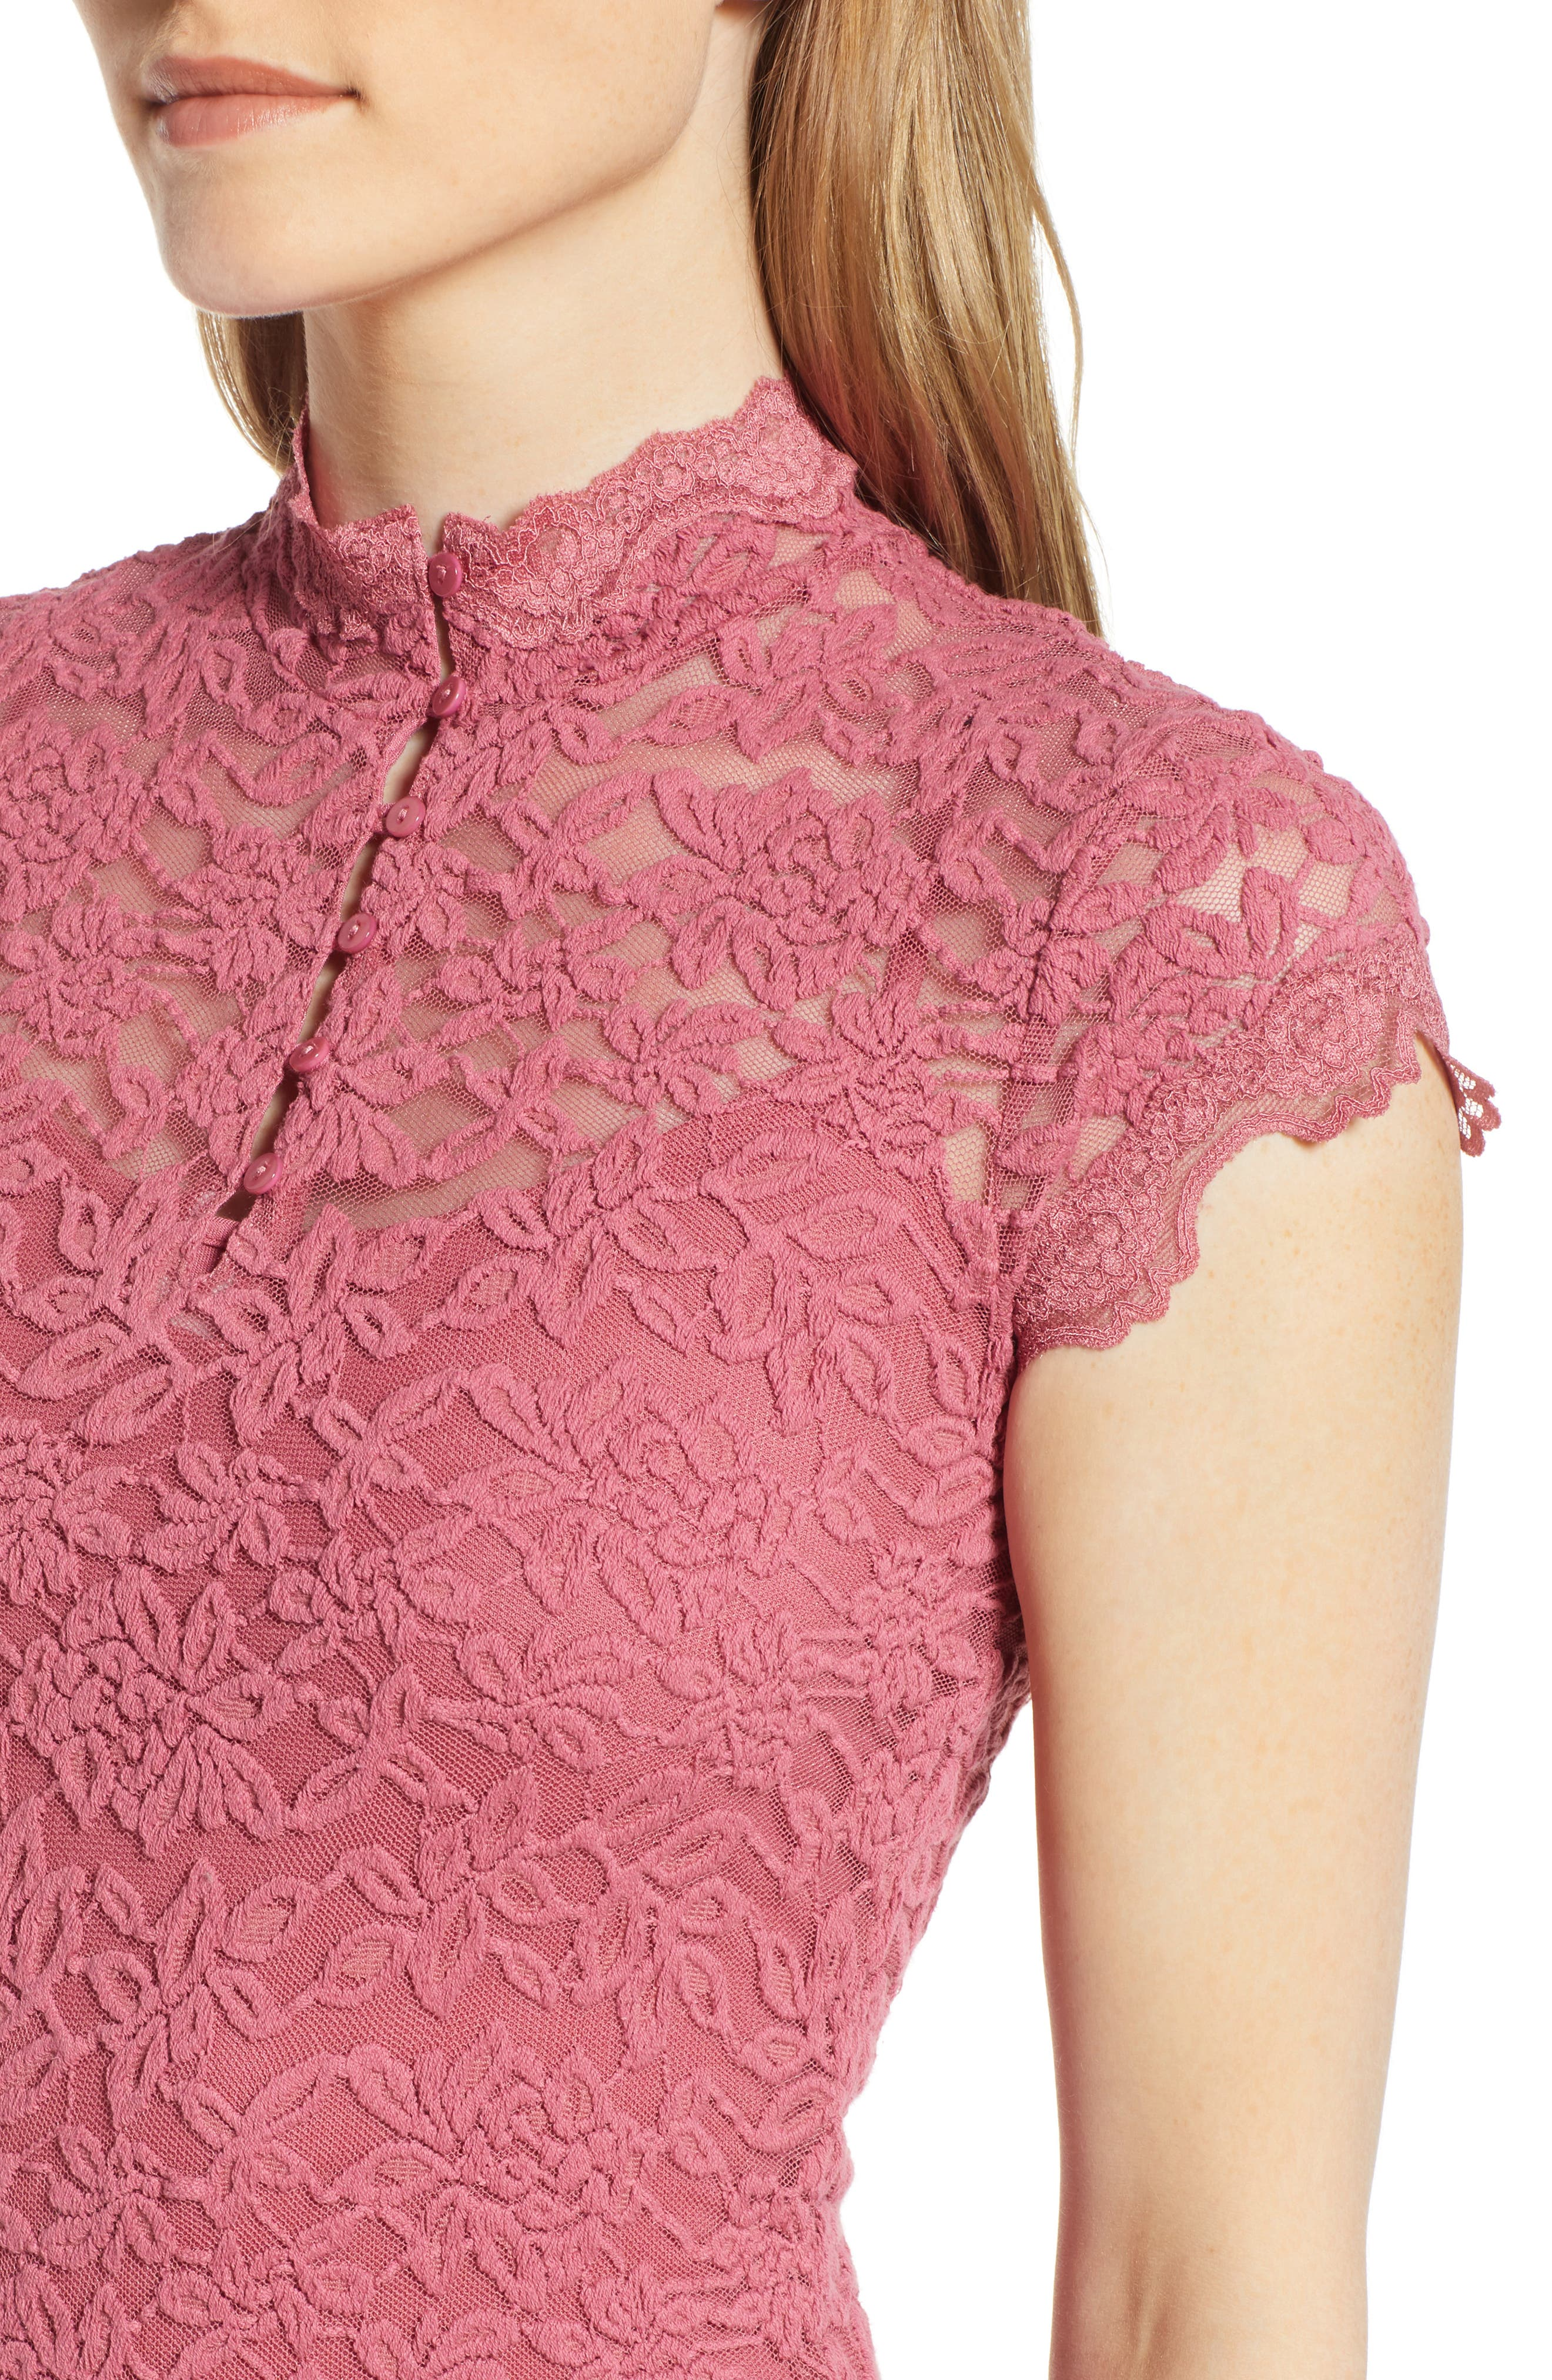 ROSEMUNDE, Delicia Lace Body-Con Dress, Alternate thumbnail 5, color, ROSEWINE 356